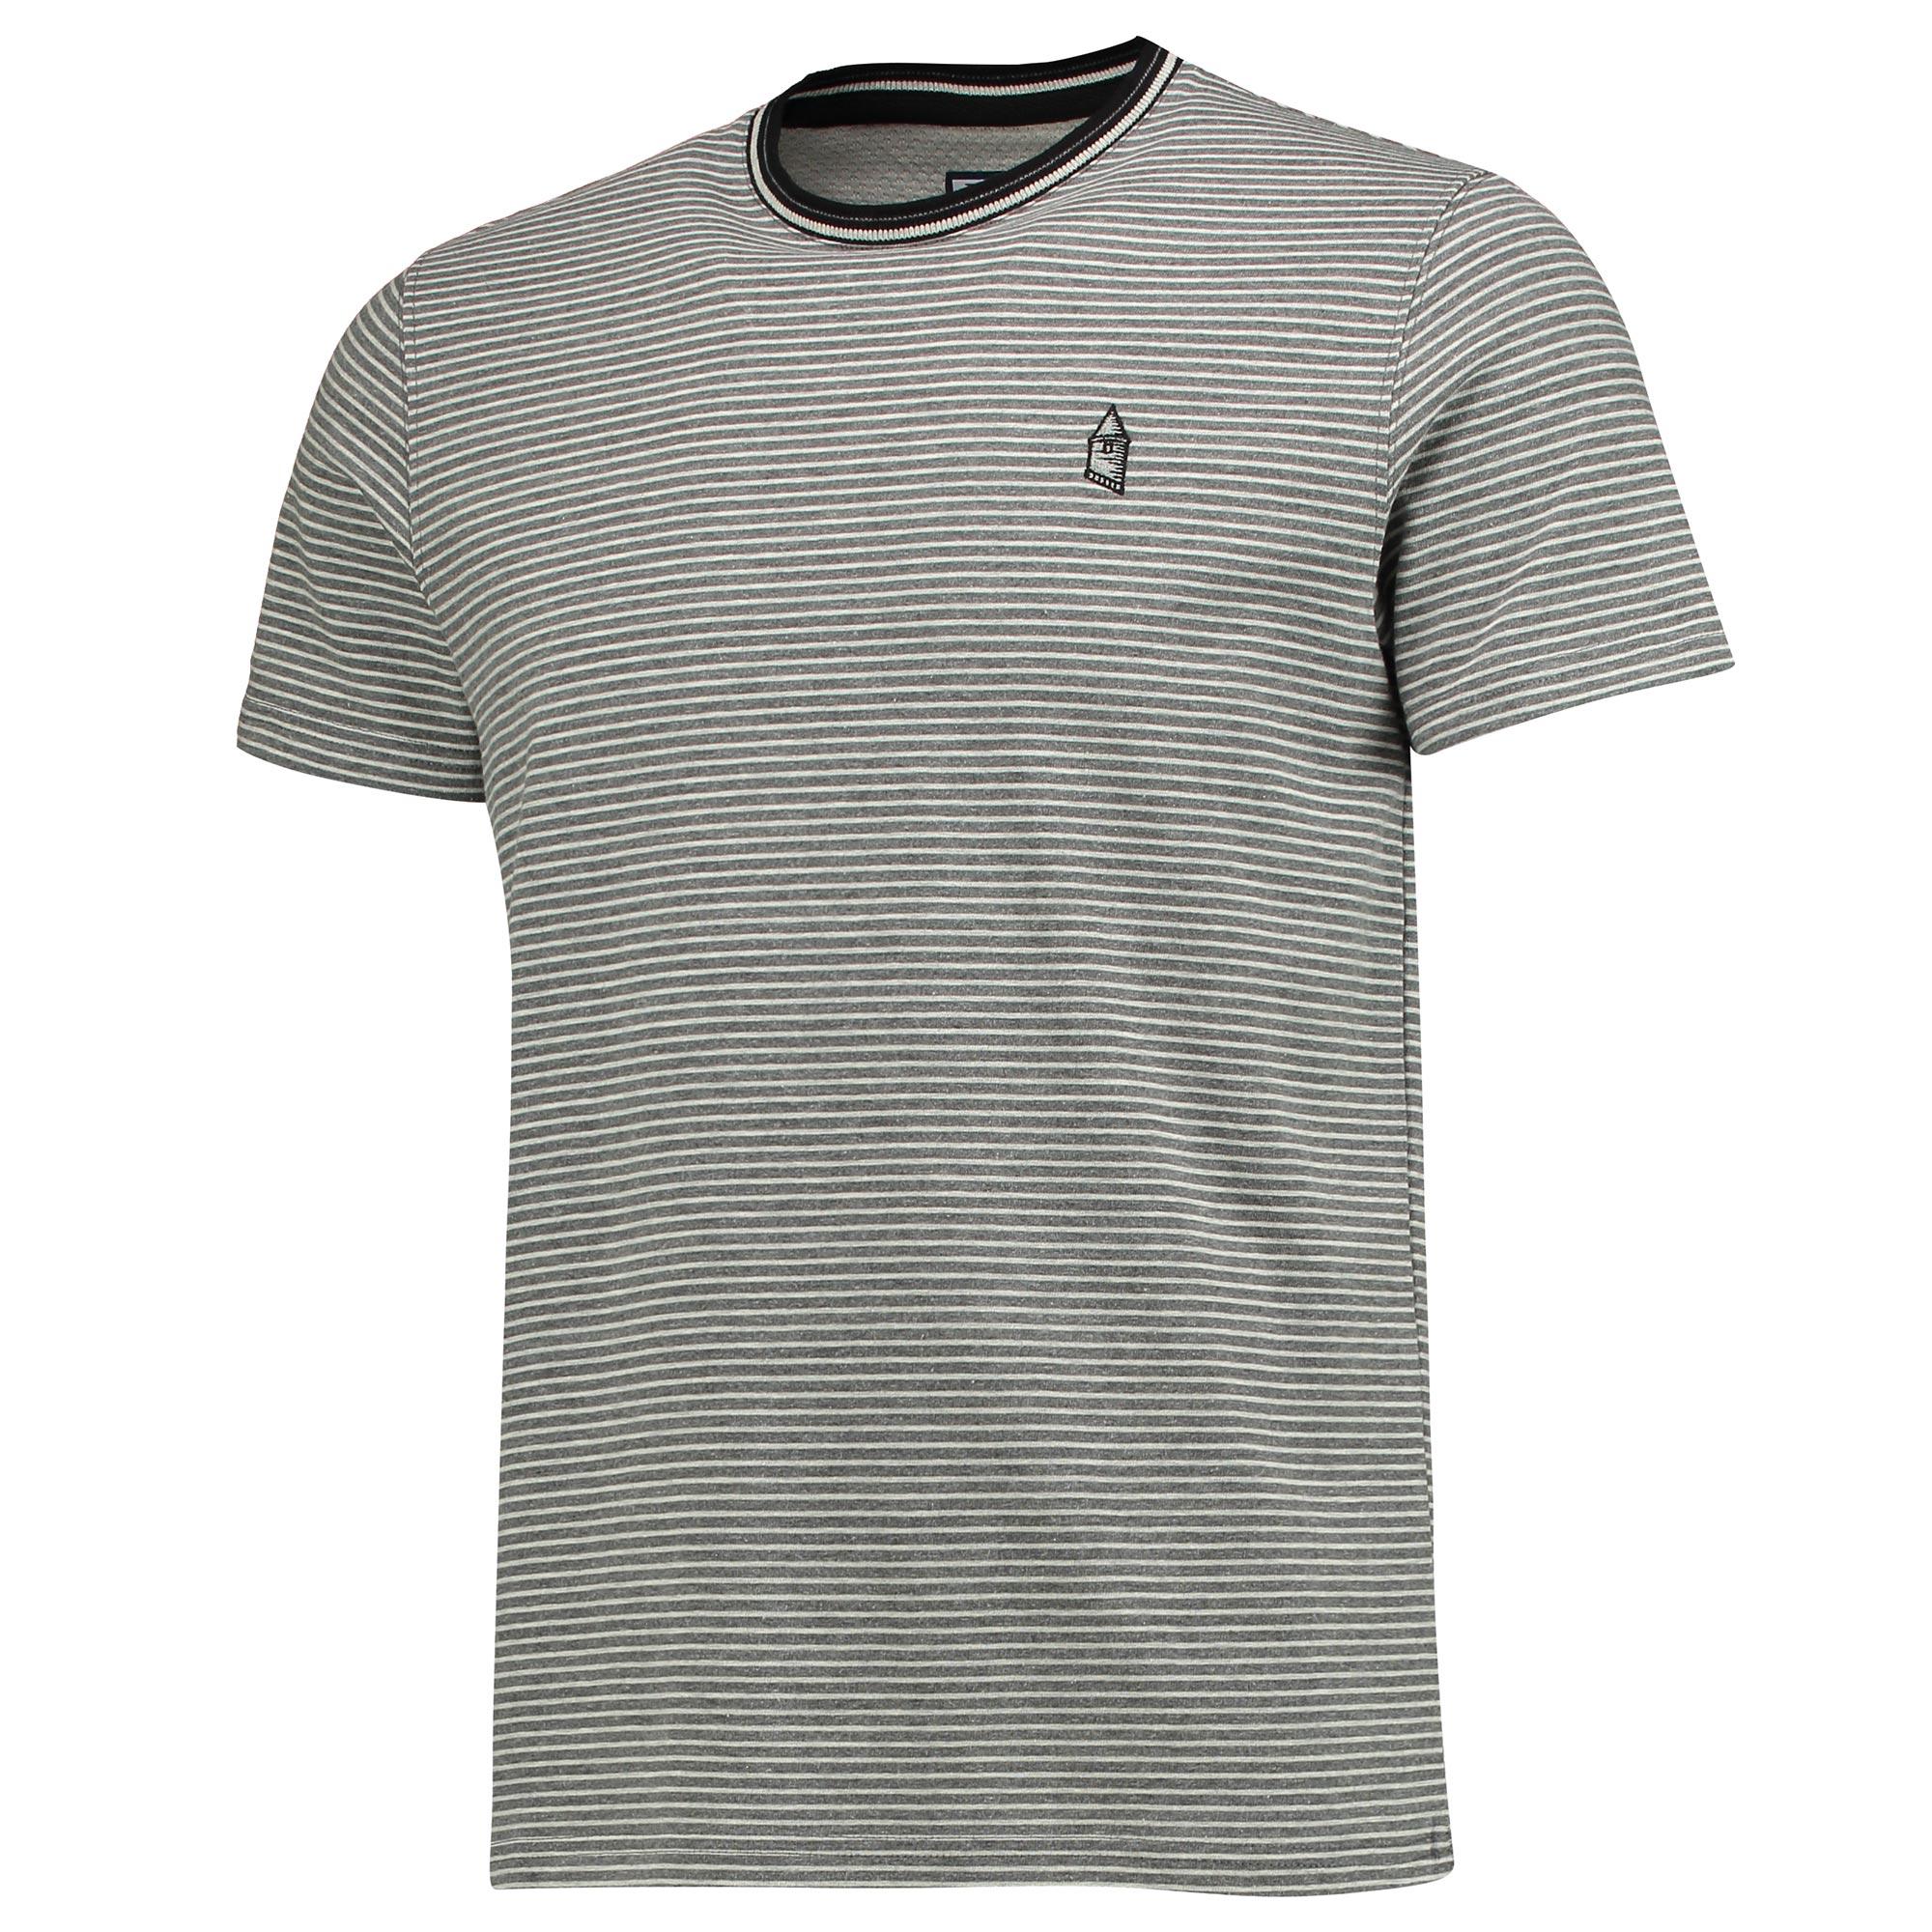 Everton Terrace T-Shirt - Grey Marl